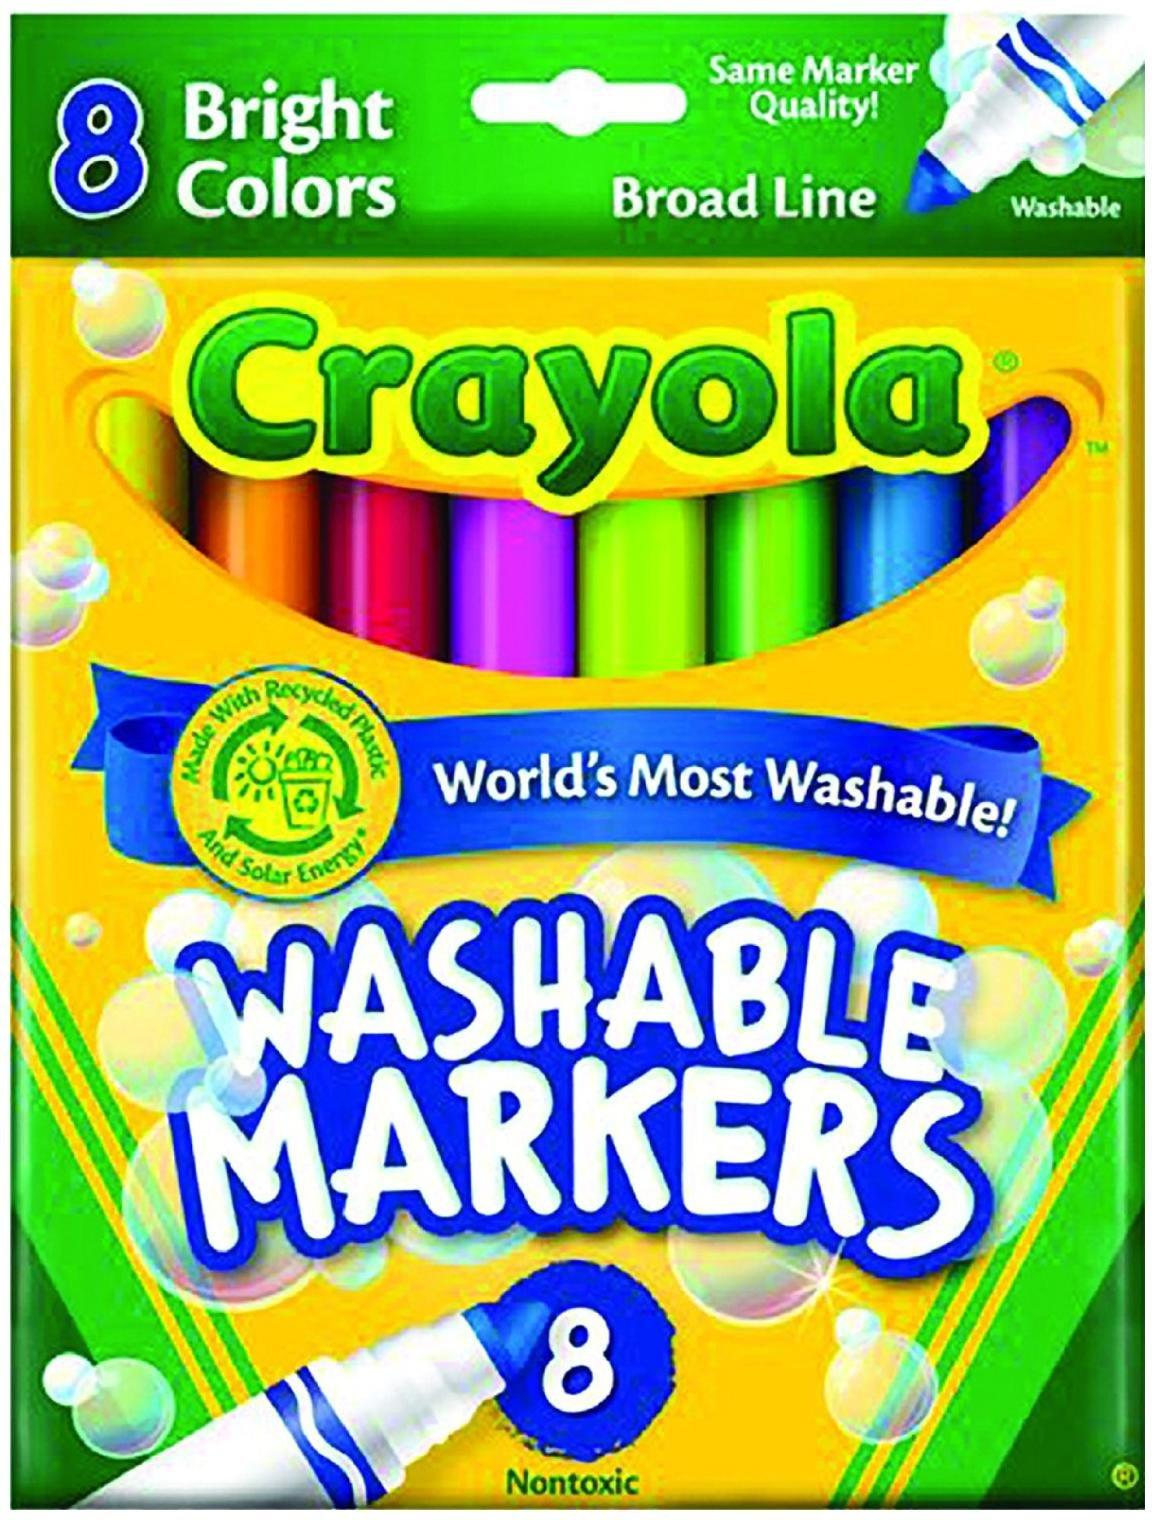 Crayola 8ct Bright Wash Broadline Markers